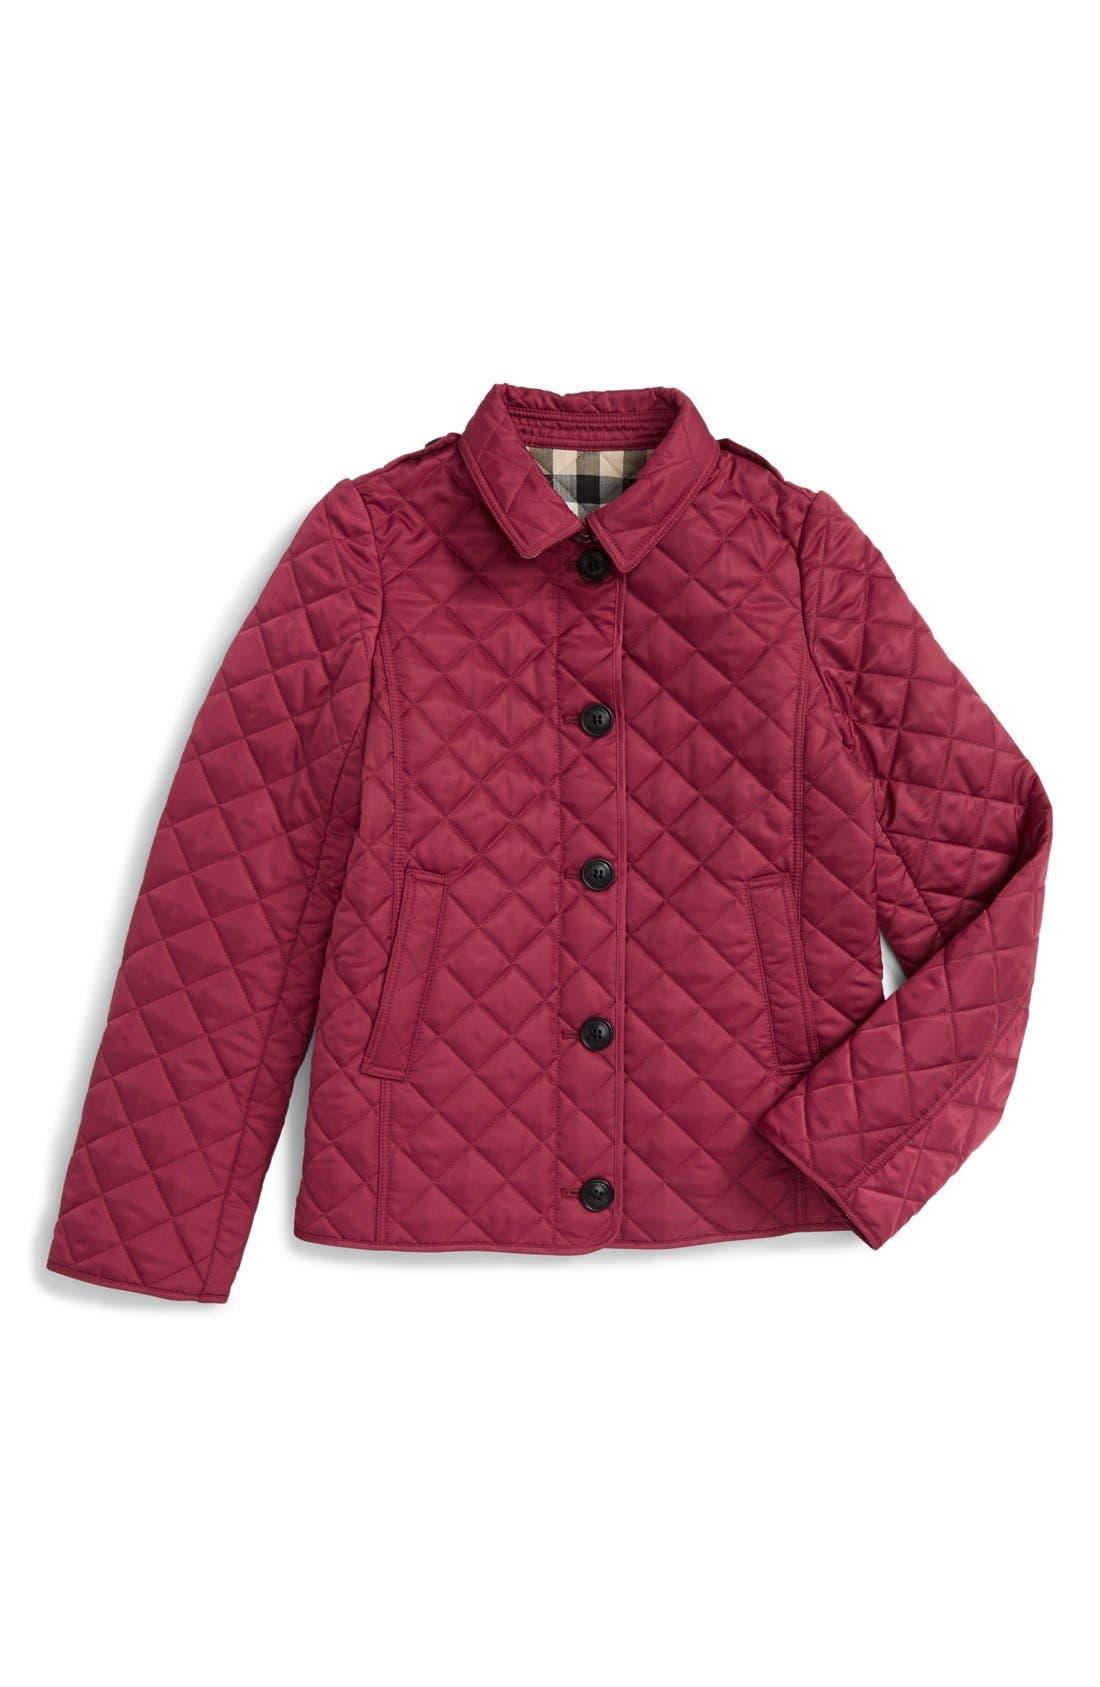 Burberry 3t jacket